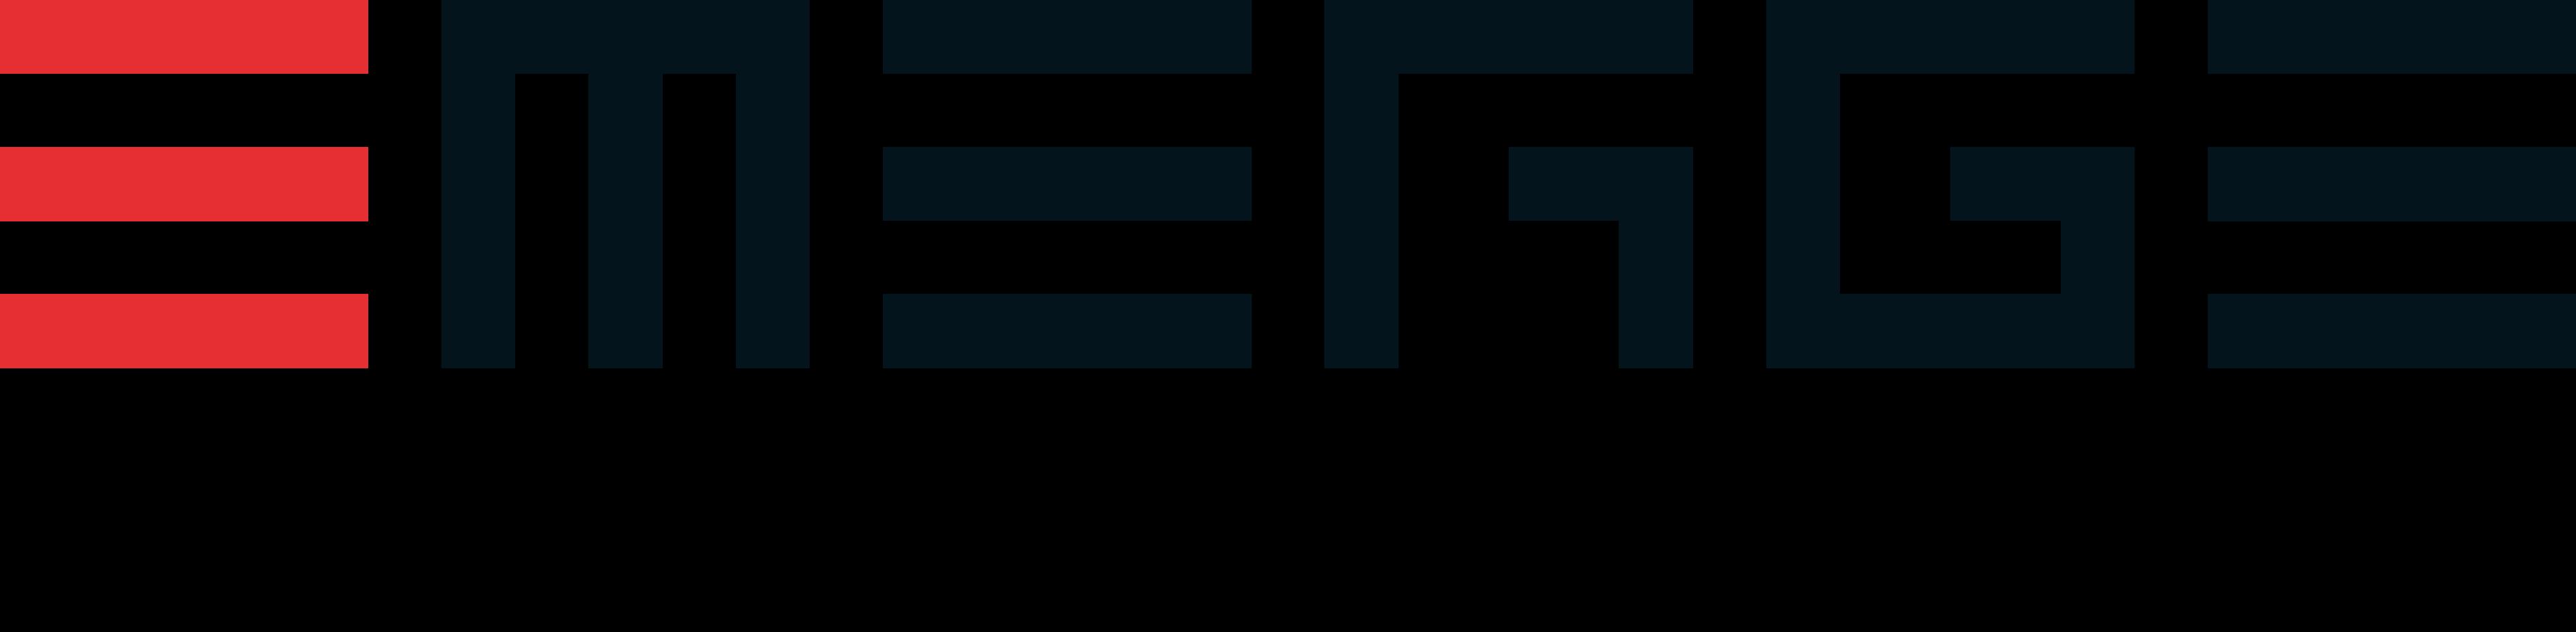 Emerge_Logo_RGB_Standalone